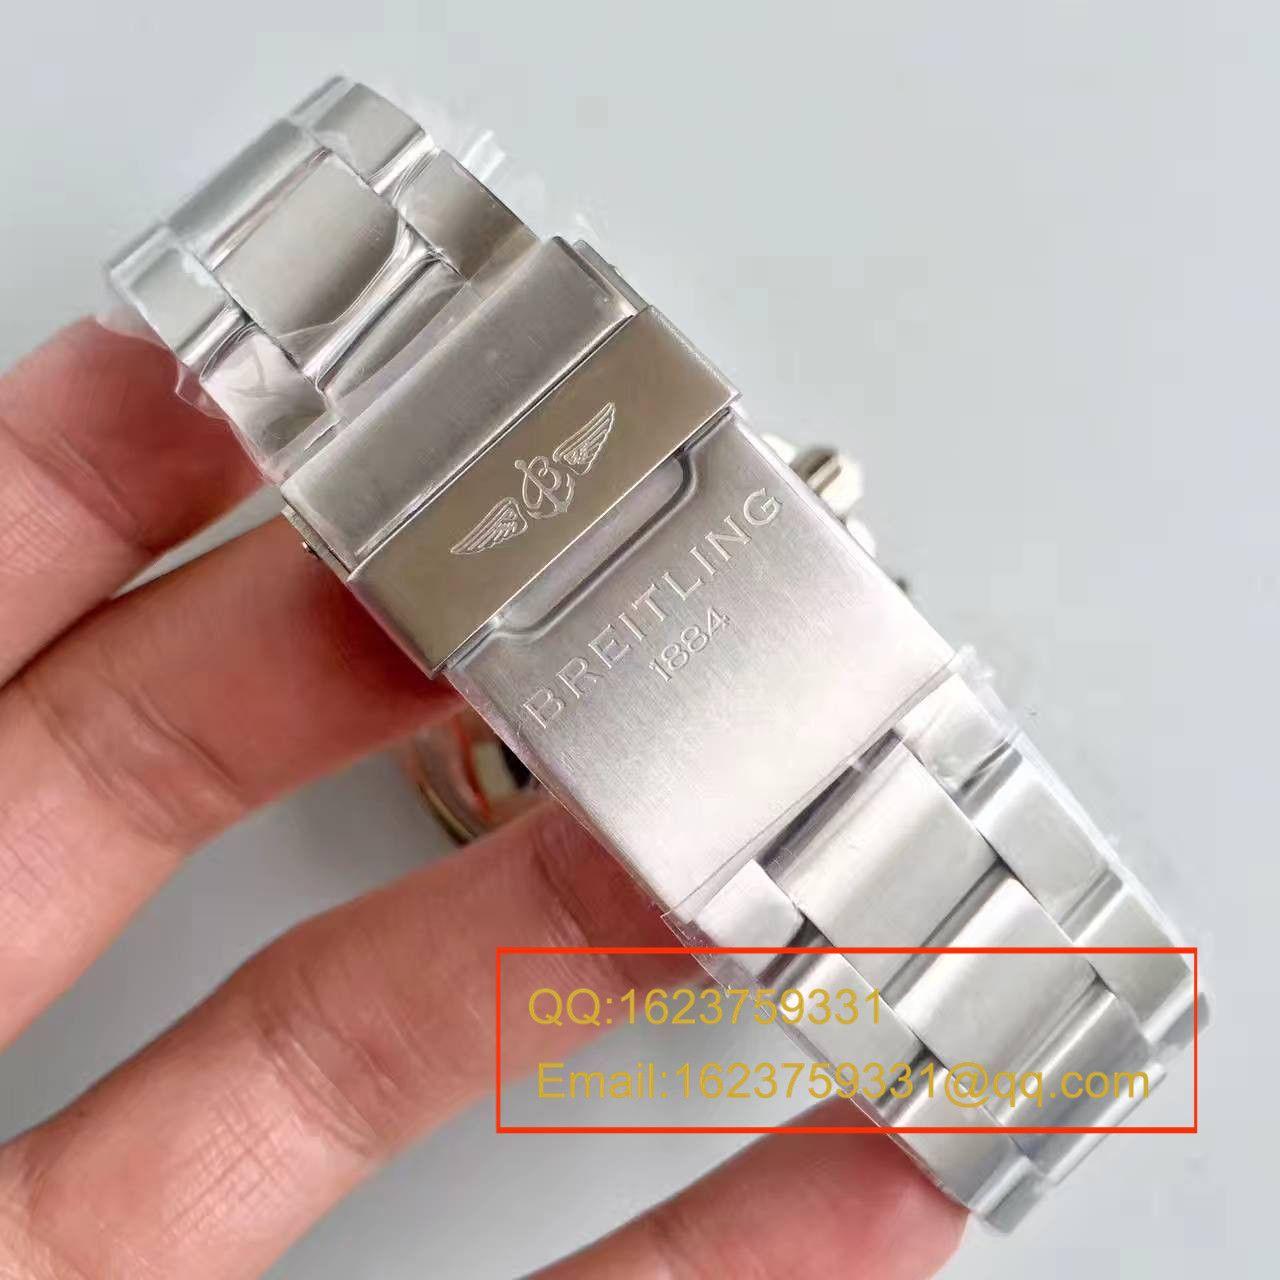 【GF一比一复刻手表】百年灵超级海洋系列A13341C3/BD19/162A钢鱼计时腕表 / BL072